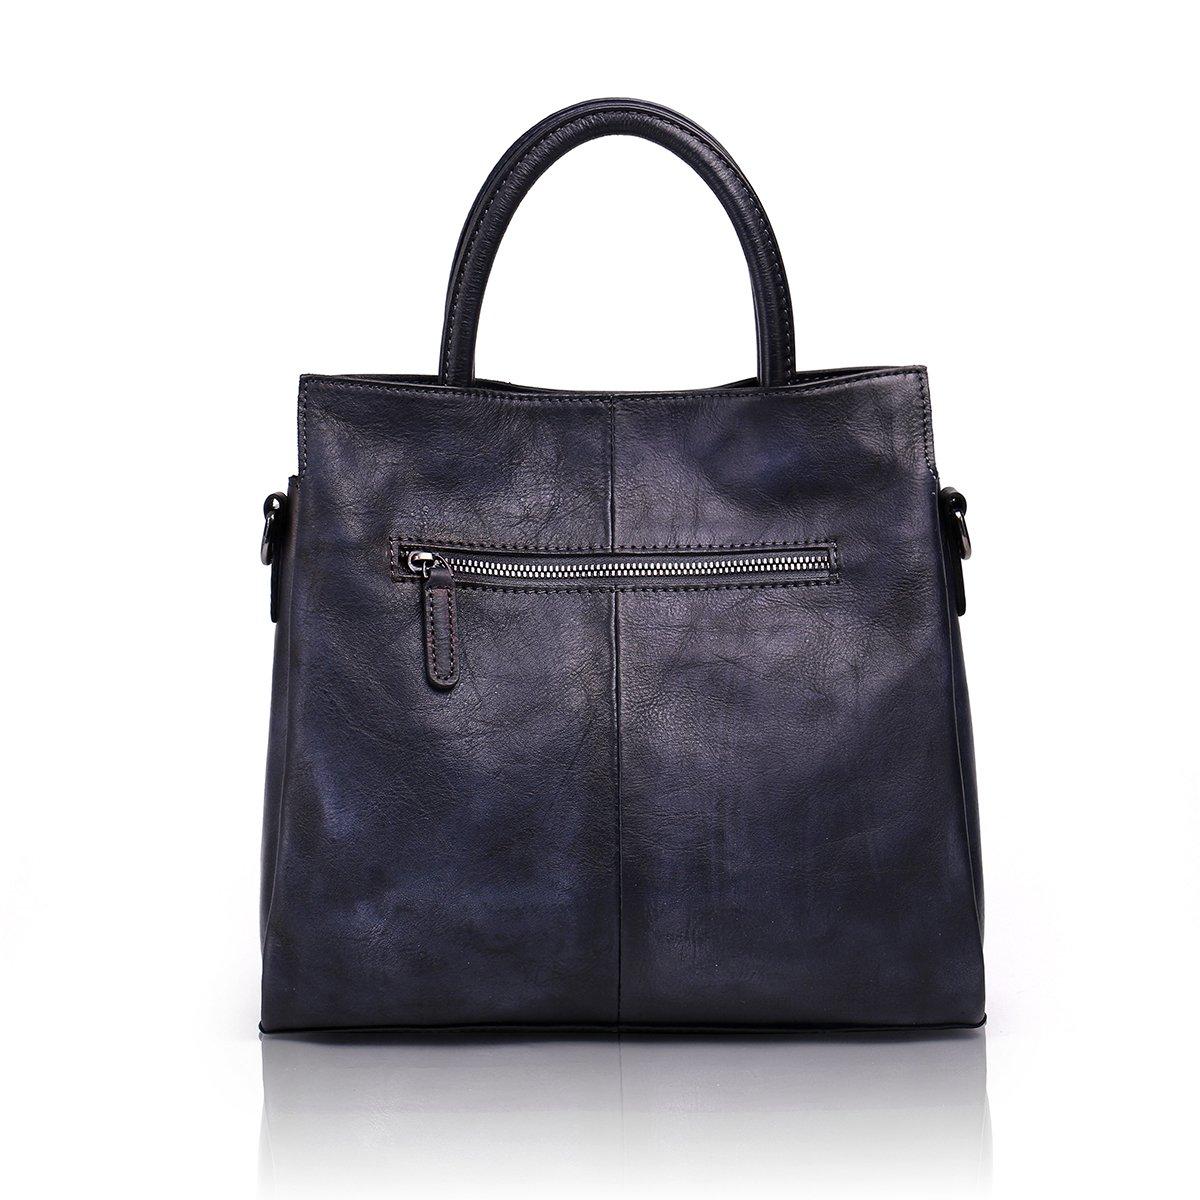 Aphison Designer Soft Leather Totes Handbags for Women, Ladies Satchels Shoulder Bags (BLACK) by APHISON (Image #3)